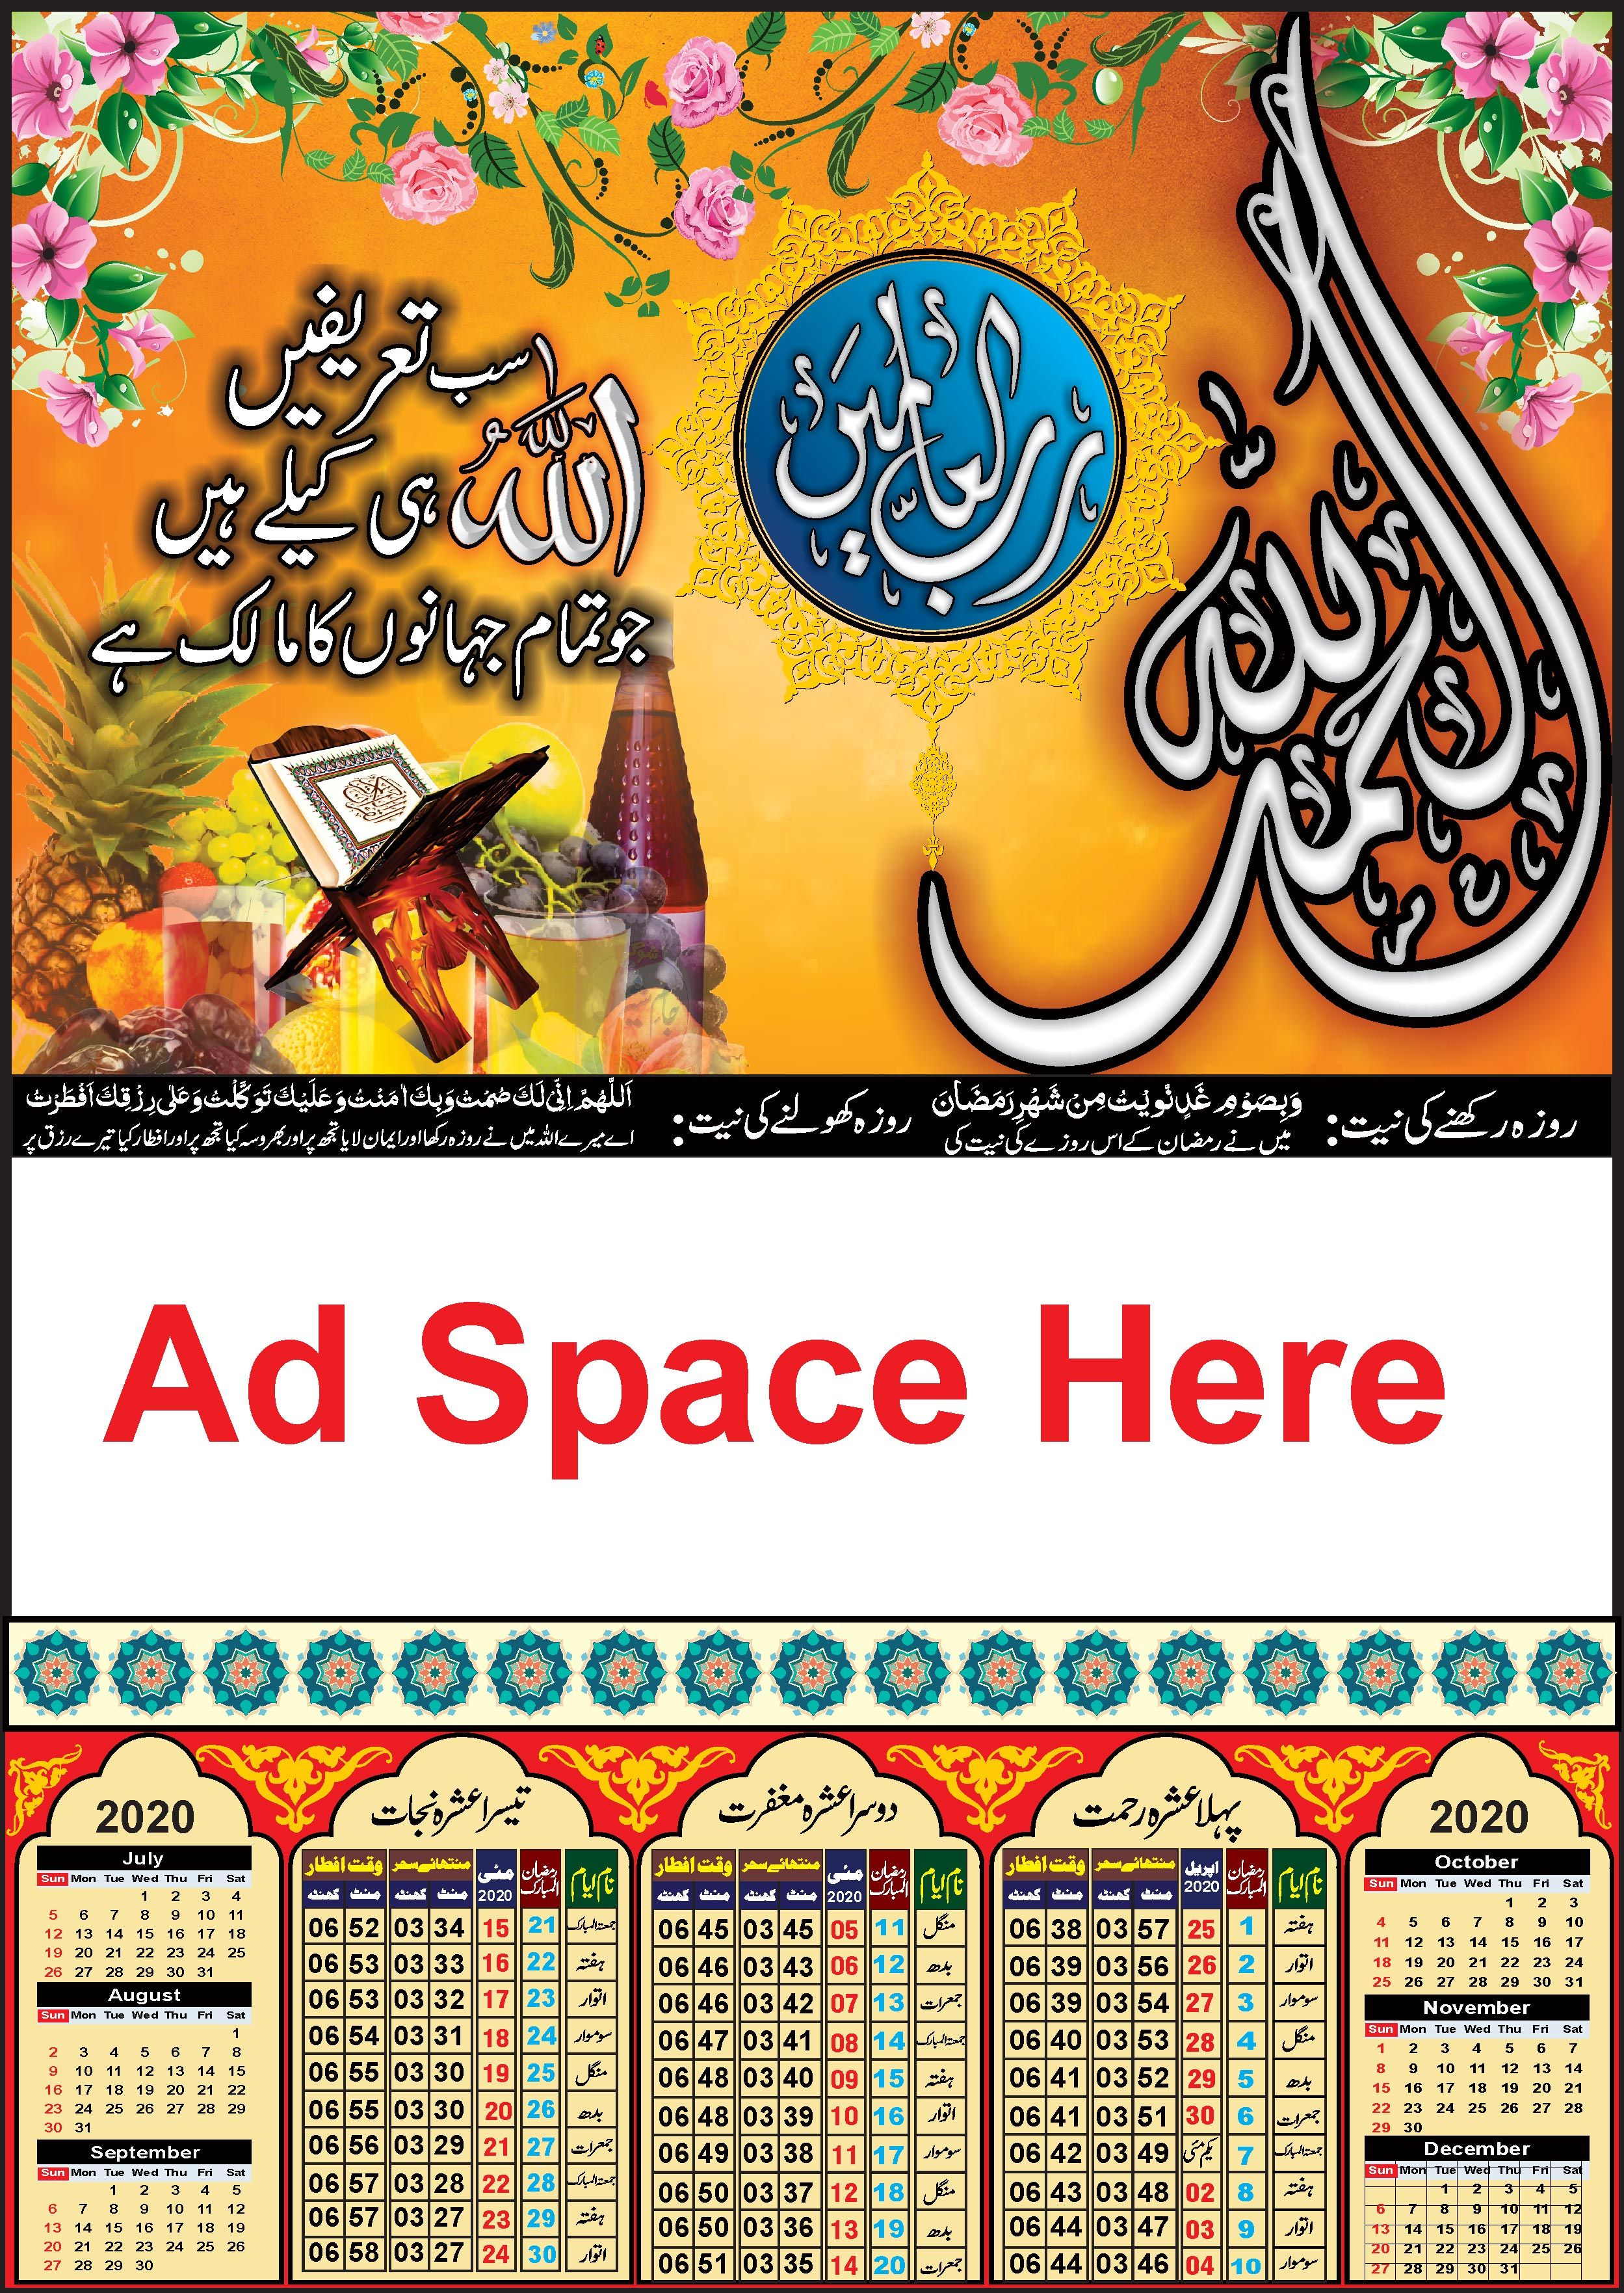 Ramadan Calendar 2020 Free Vector Design Cdr File Downoad Calendar Design Calender Design Islamic Calendar